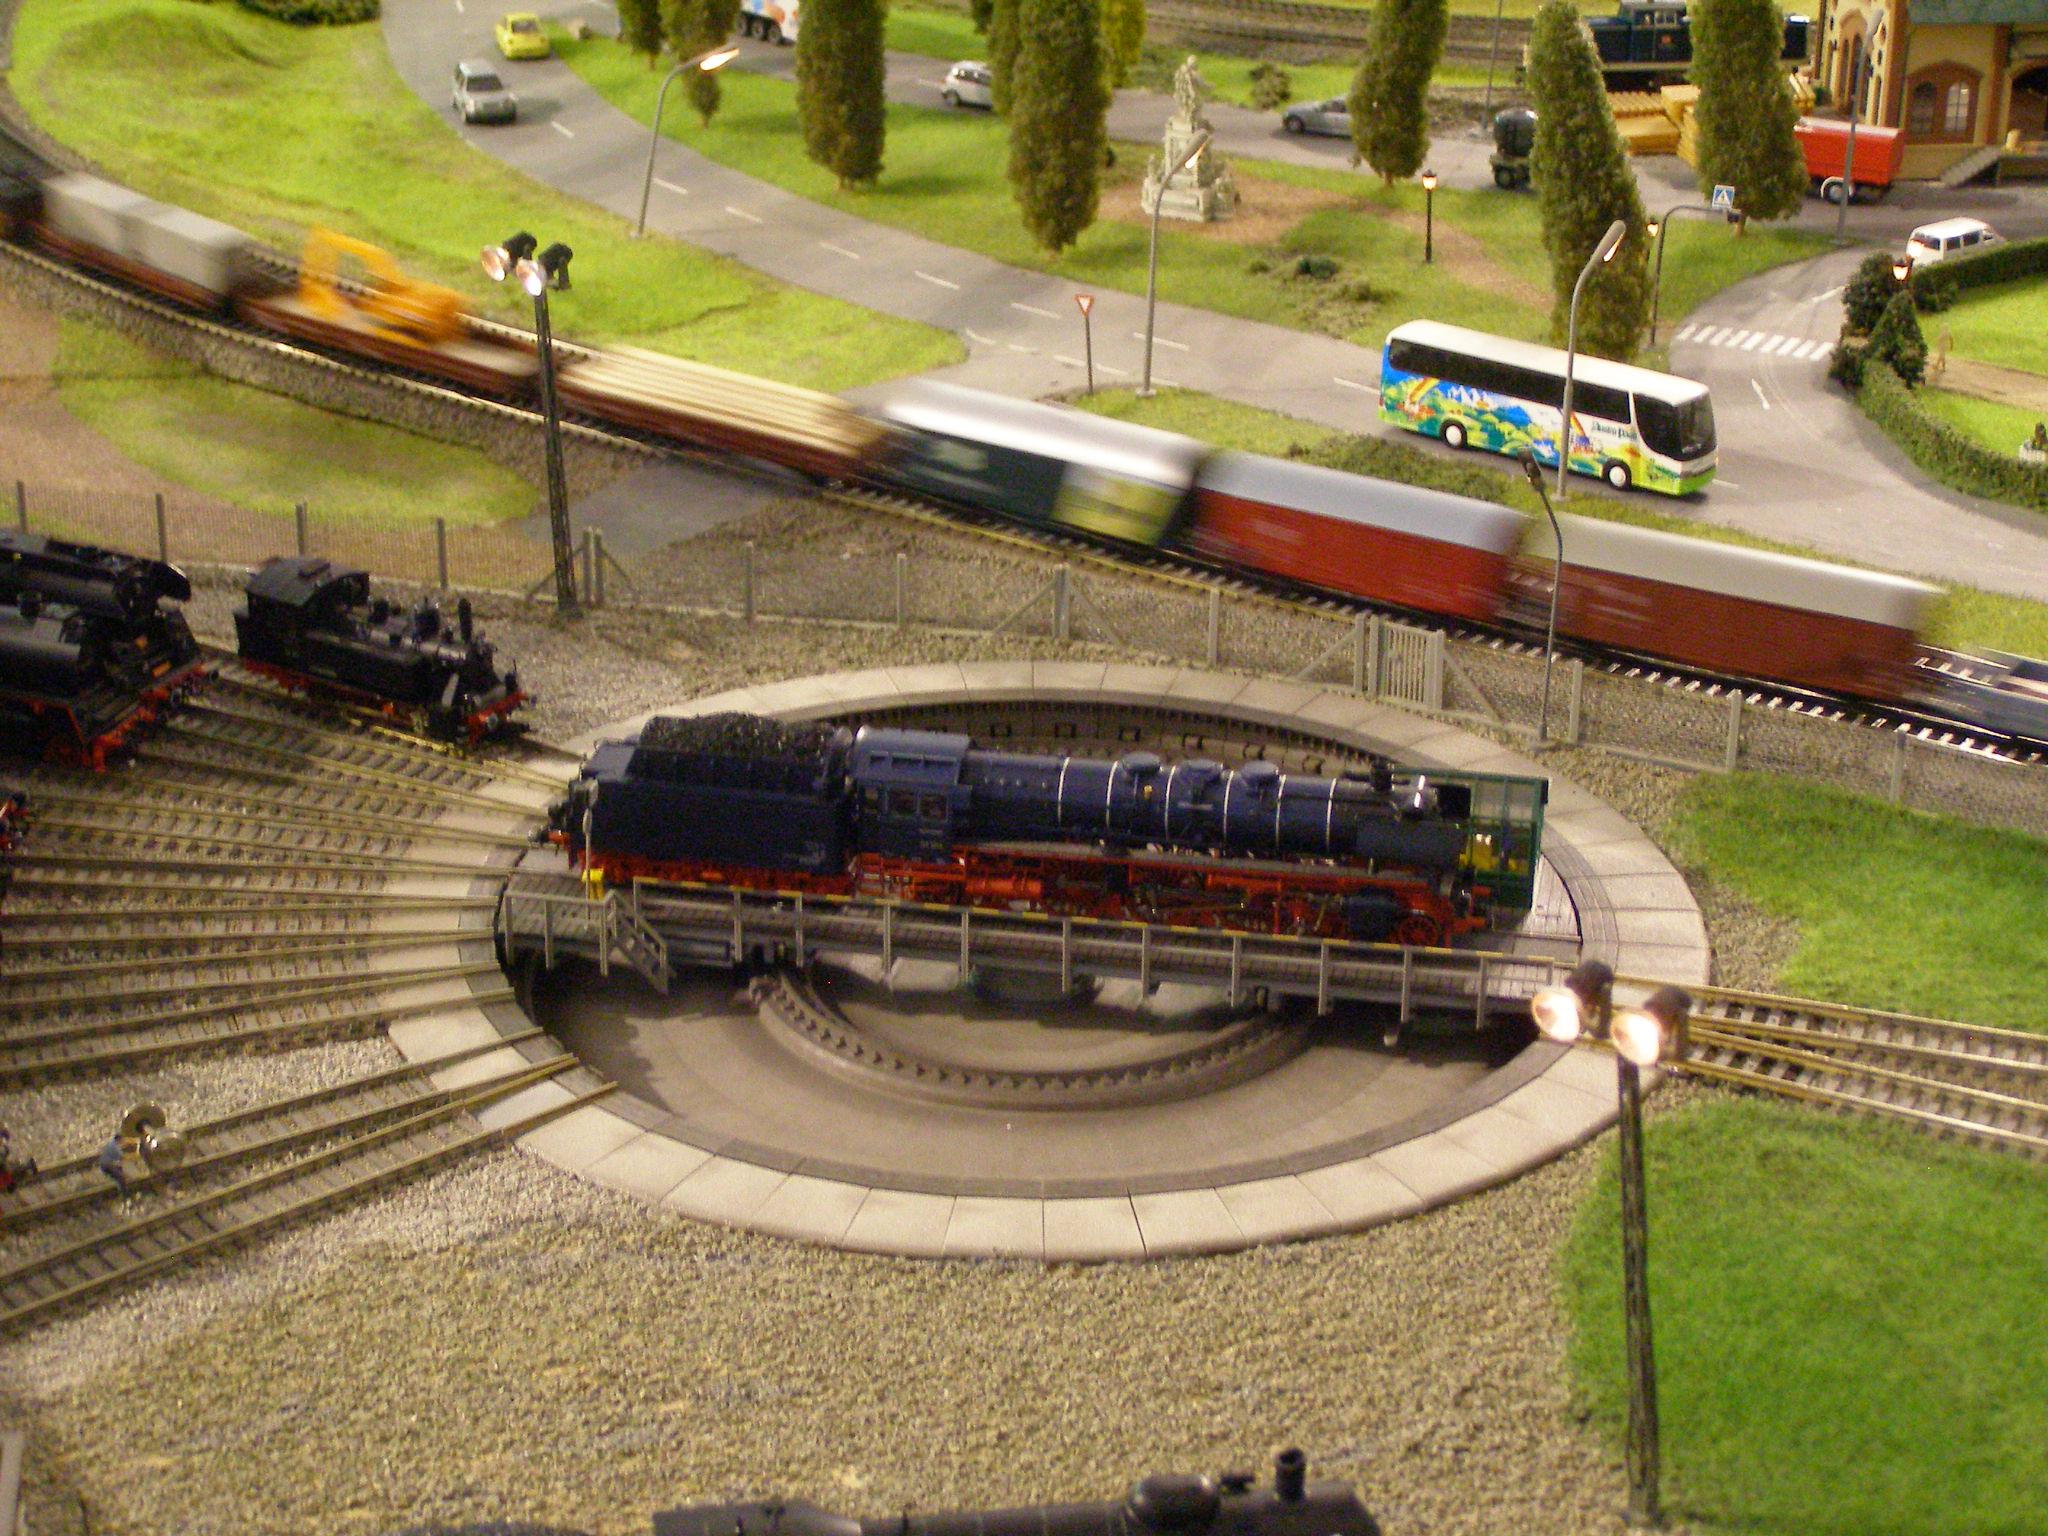 Sinai model railway